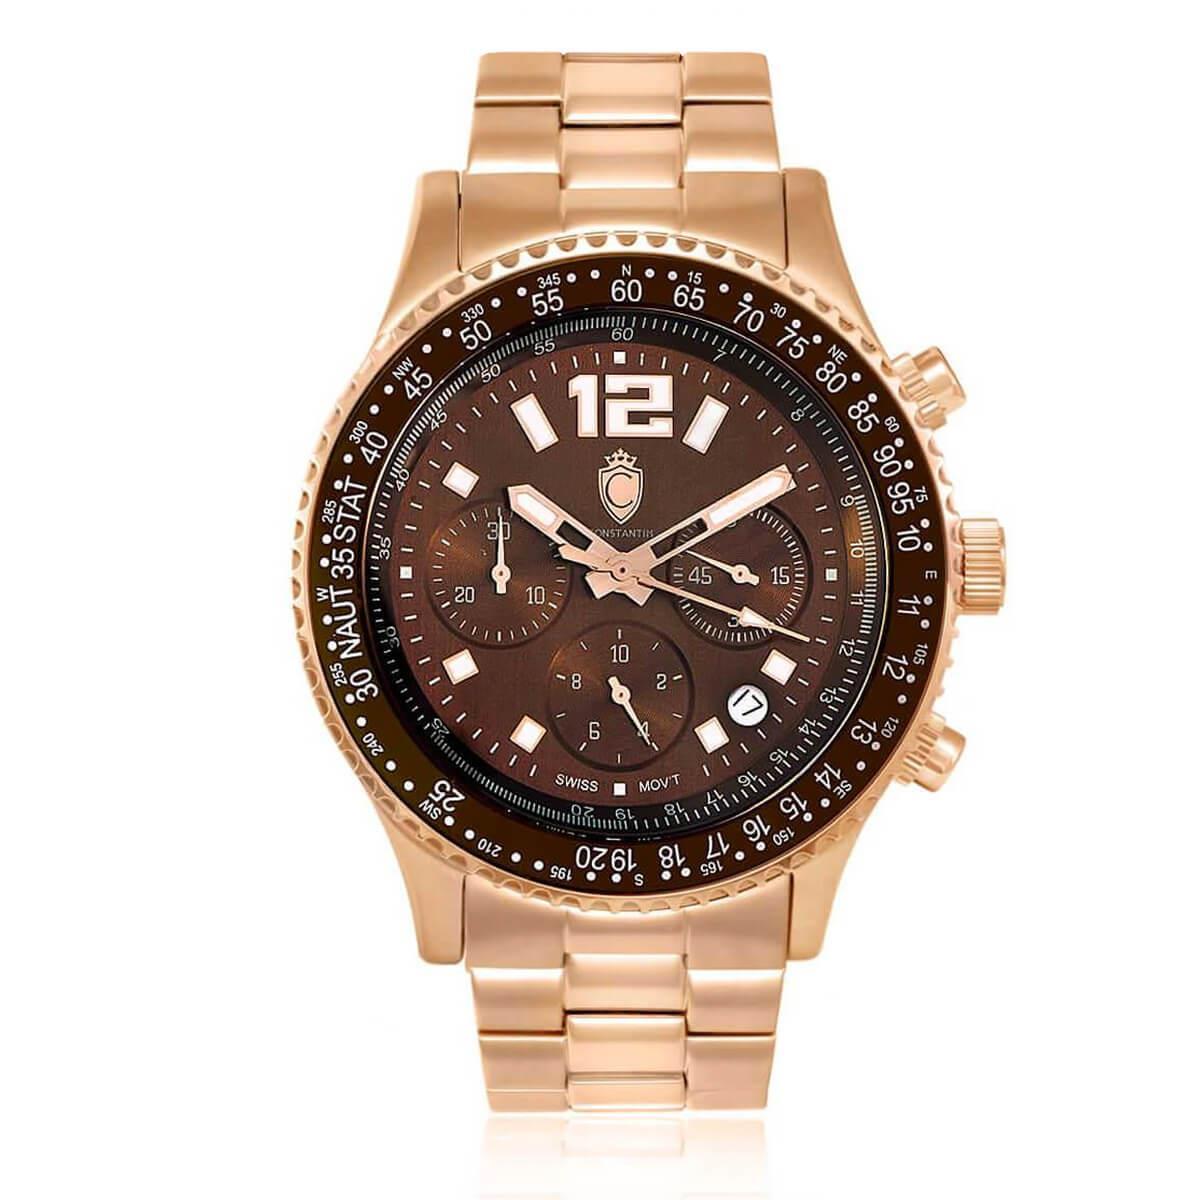 fa3895f3267 Relógio Masculino Constantim Navitimer Analógico CT-01 G0099C Rose Brown